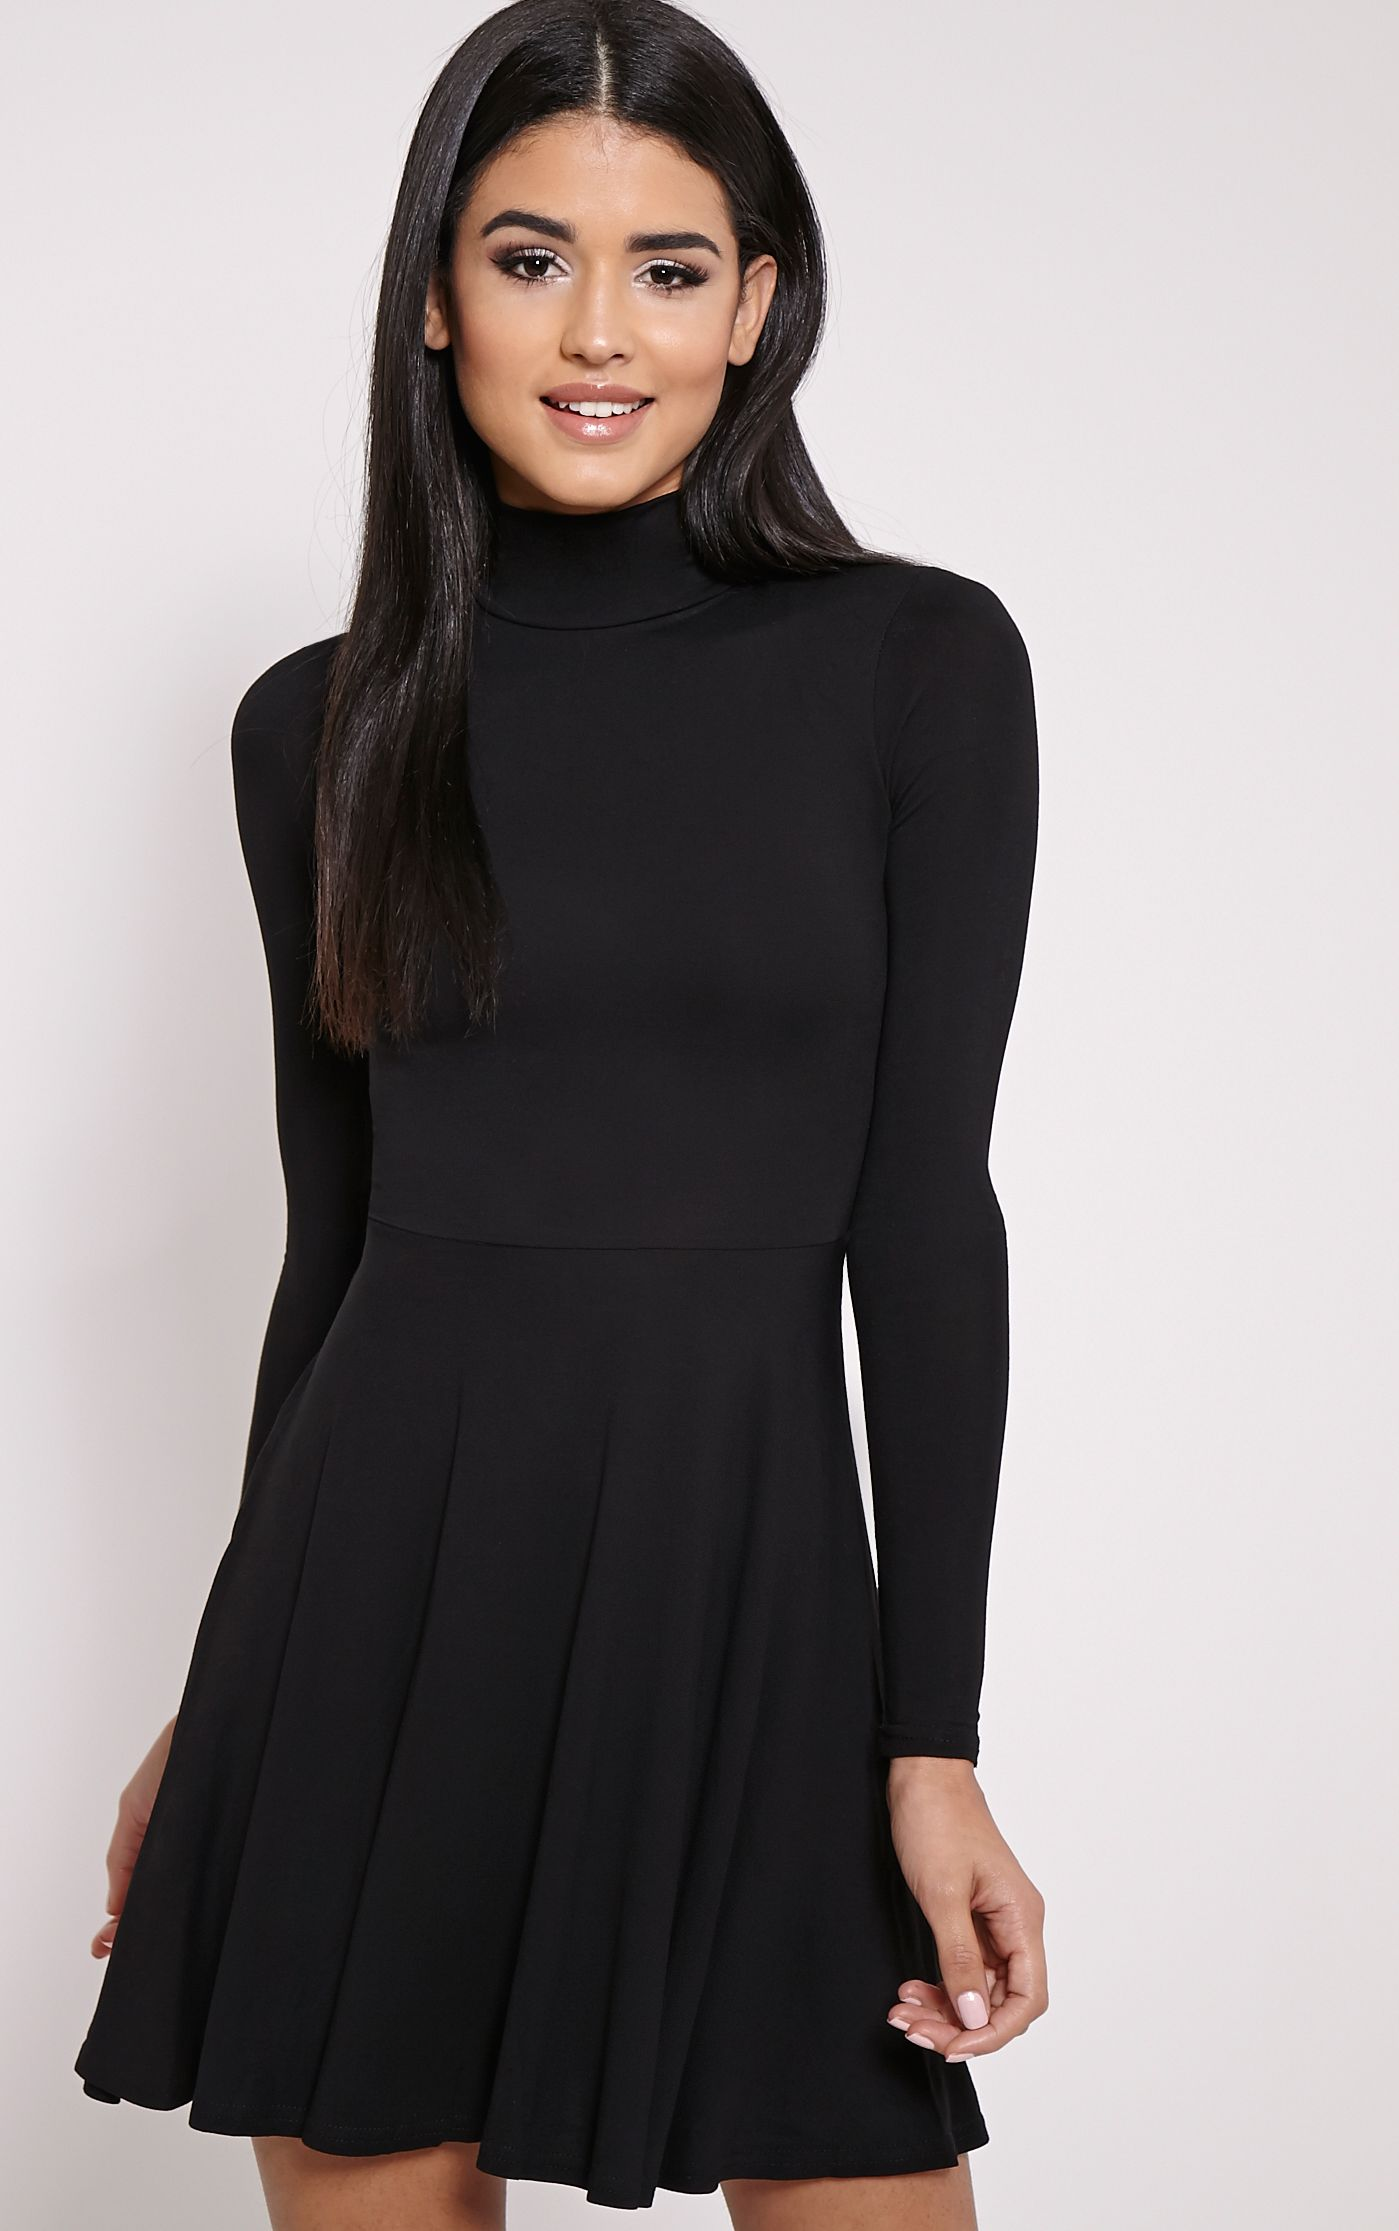 Petite Basic Black High Neck Jersey Dress 1